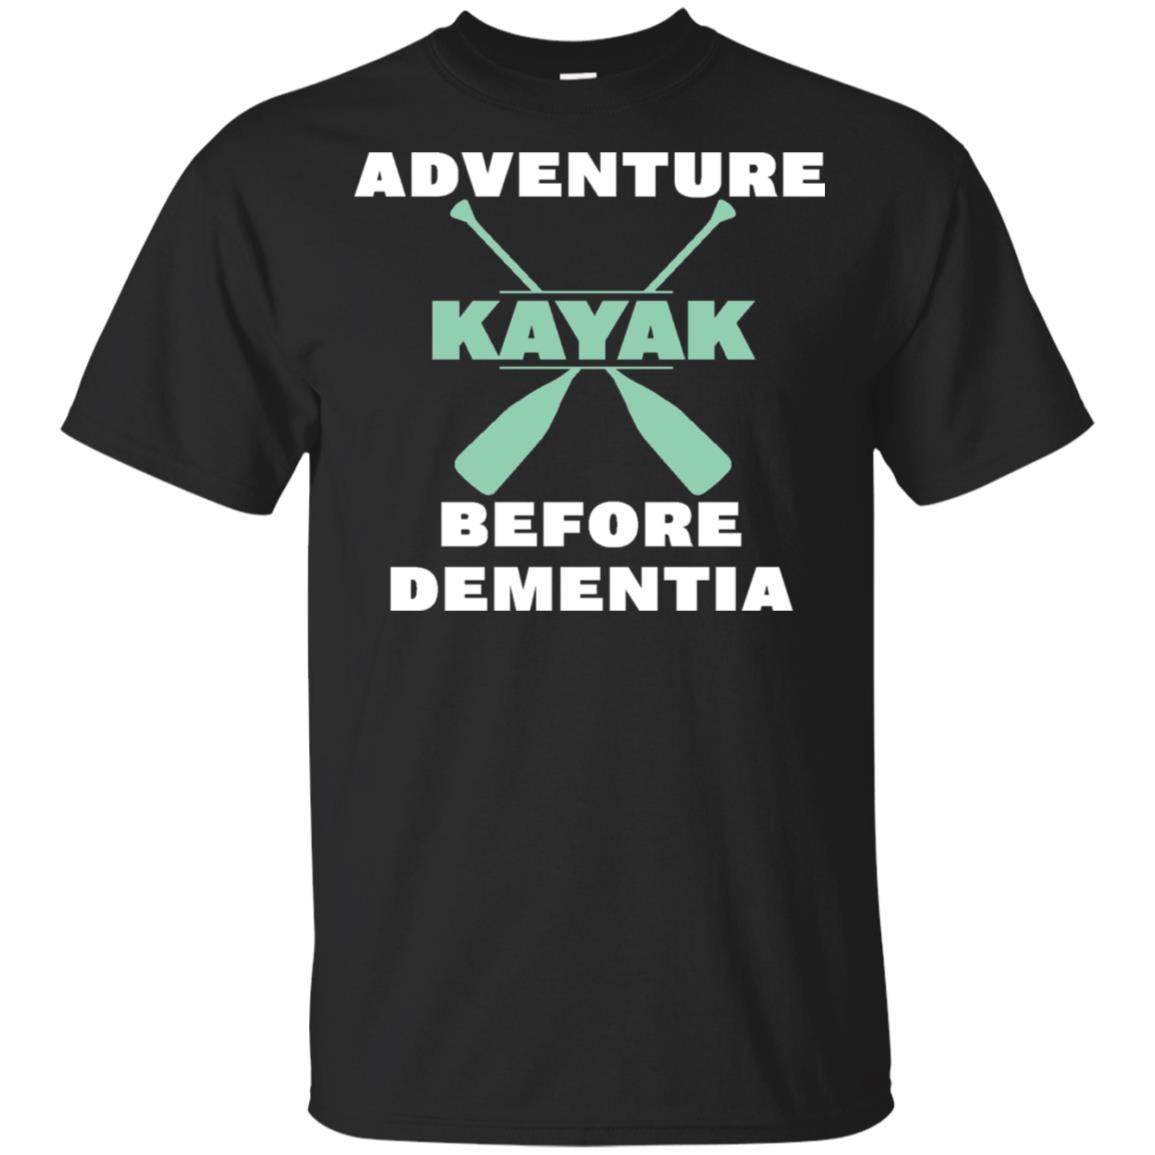 Kayak – Adventure Before Dementia Unisex Short Sleeve